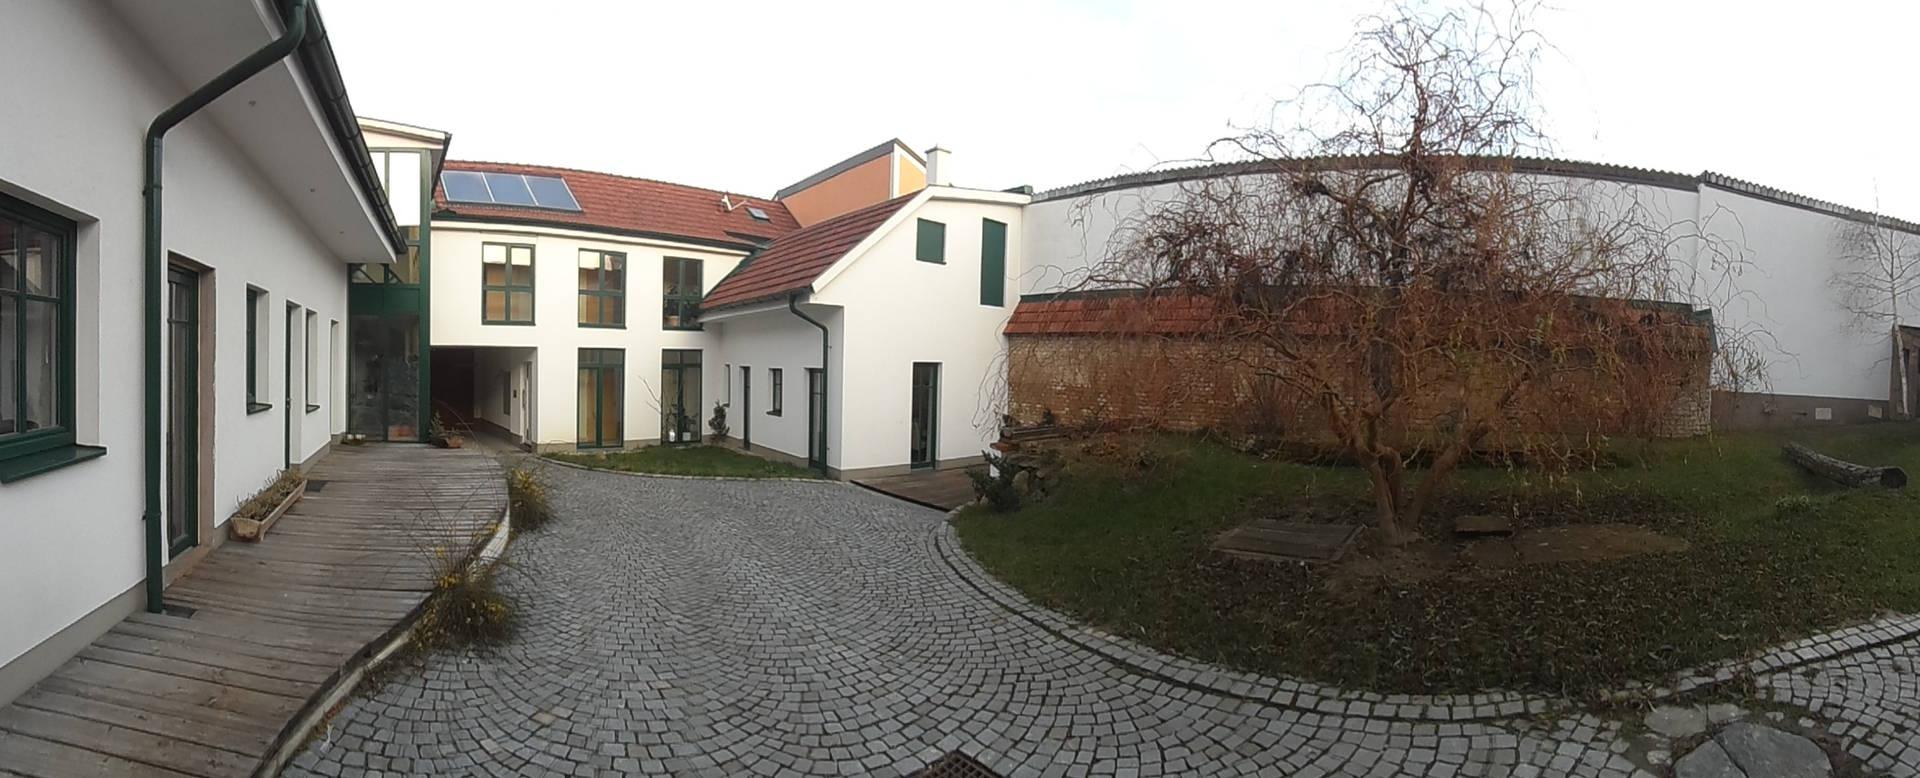 Innenhof Gästehaus Lösshof